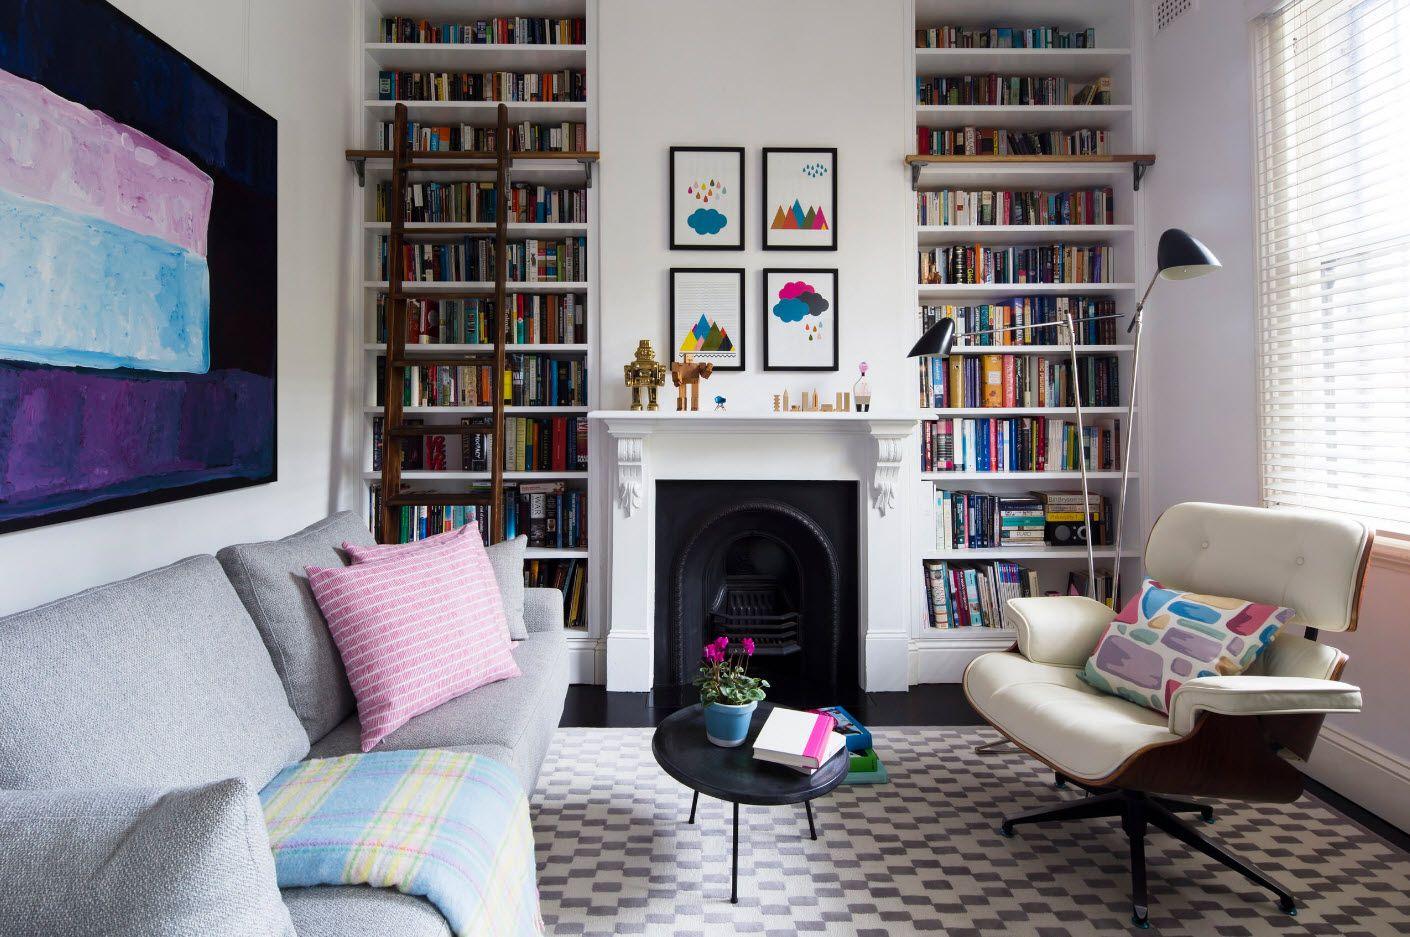 Nice floor-to-ceiling book shelves